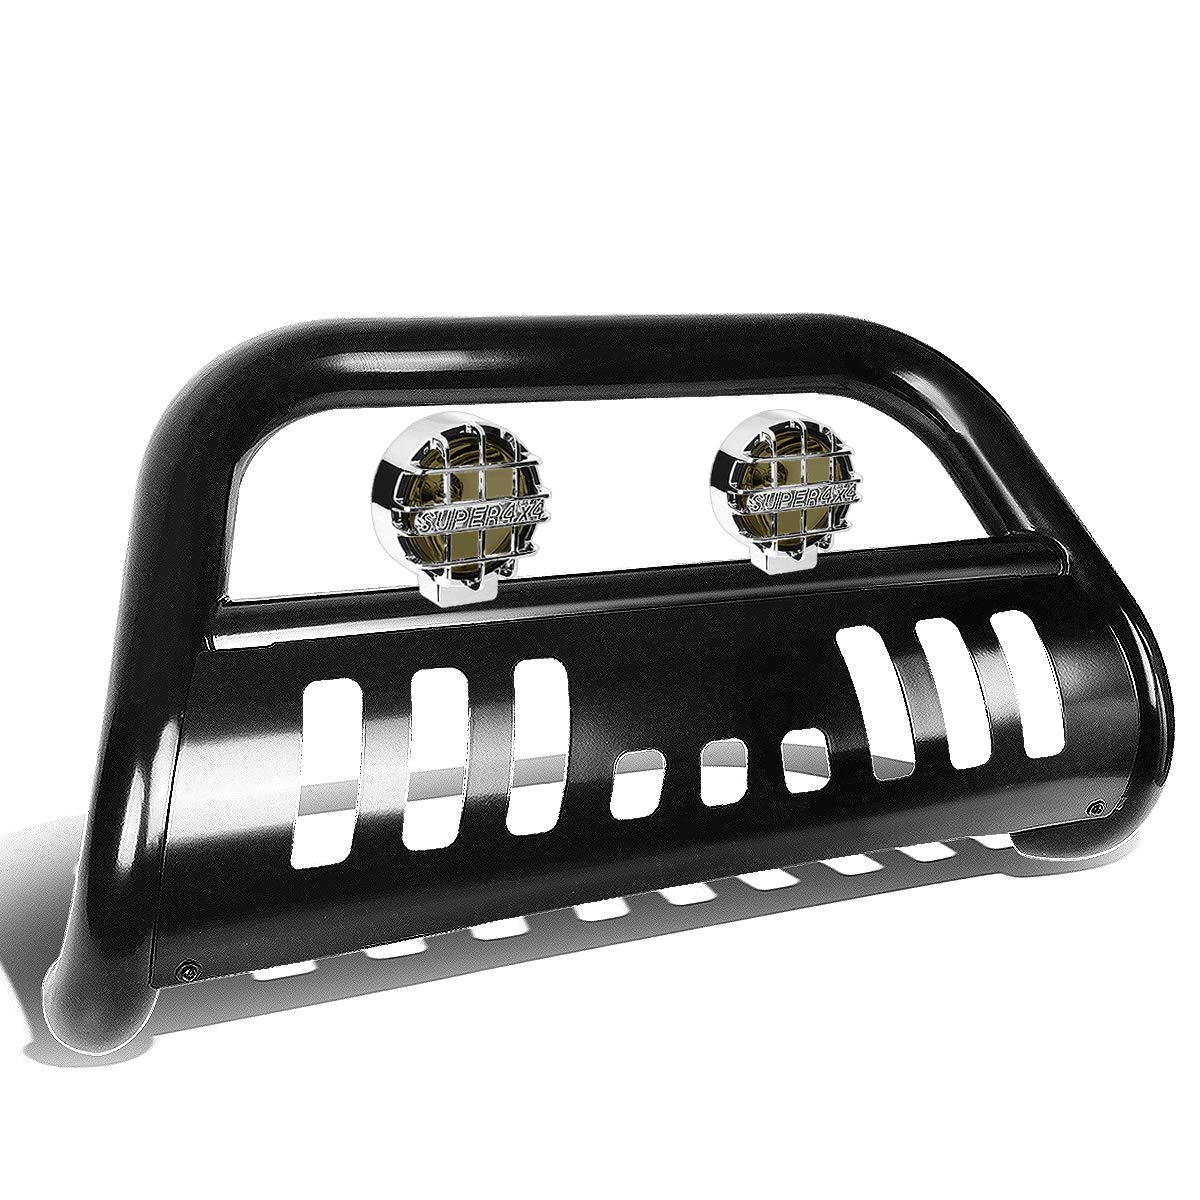 For Pathfinder//Frontier//Xterra 3 inches Black Bull Bar+6 inches Black Housing Amber Lens Fog Lights